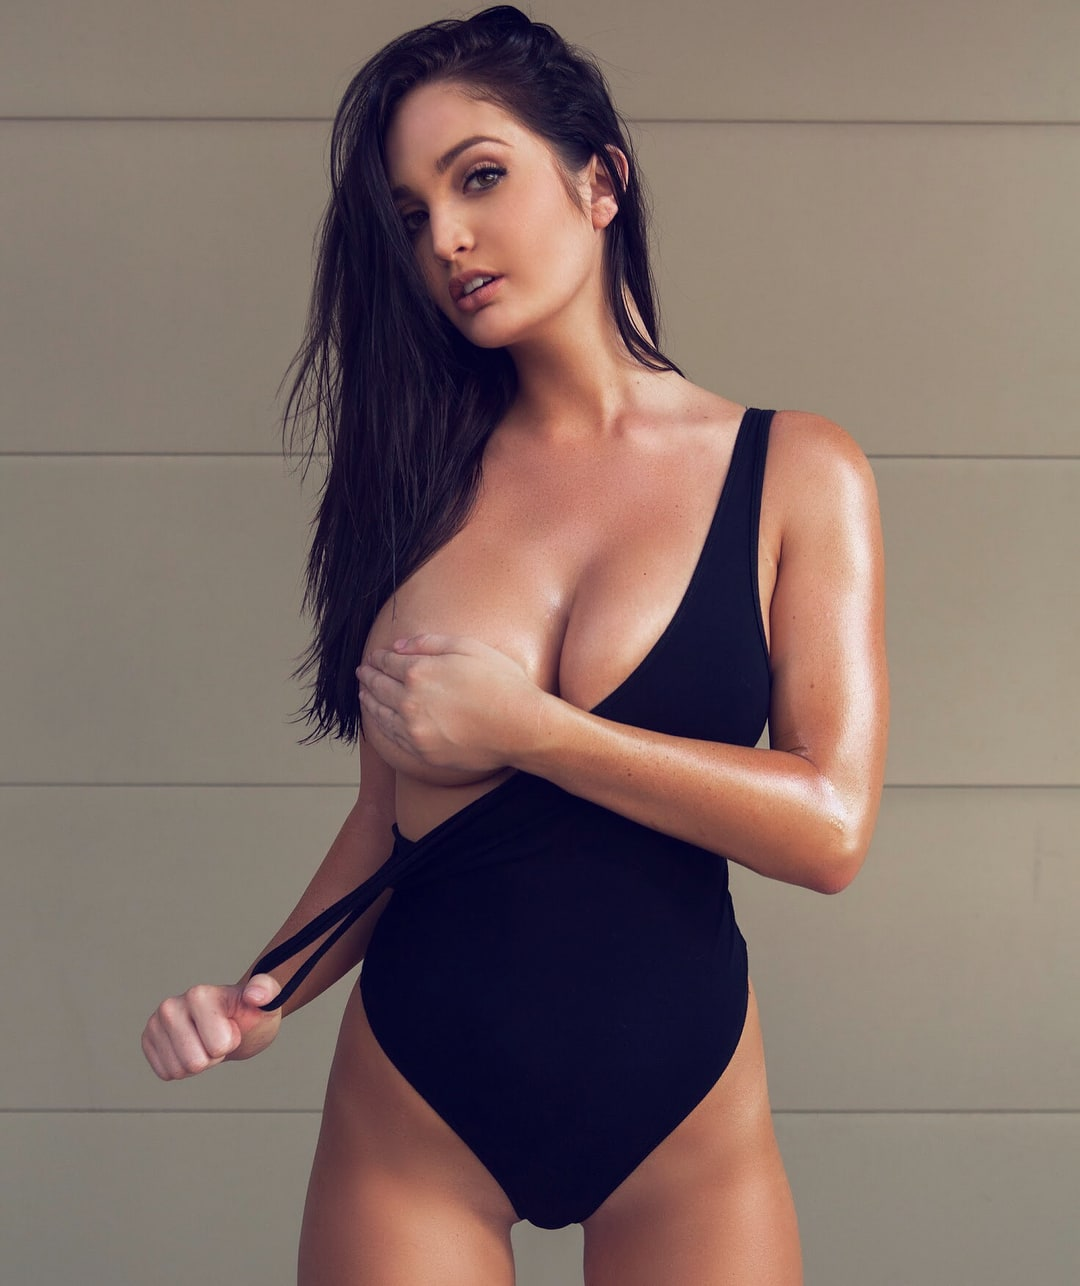 Ashlynn Coray Nude Photos 74